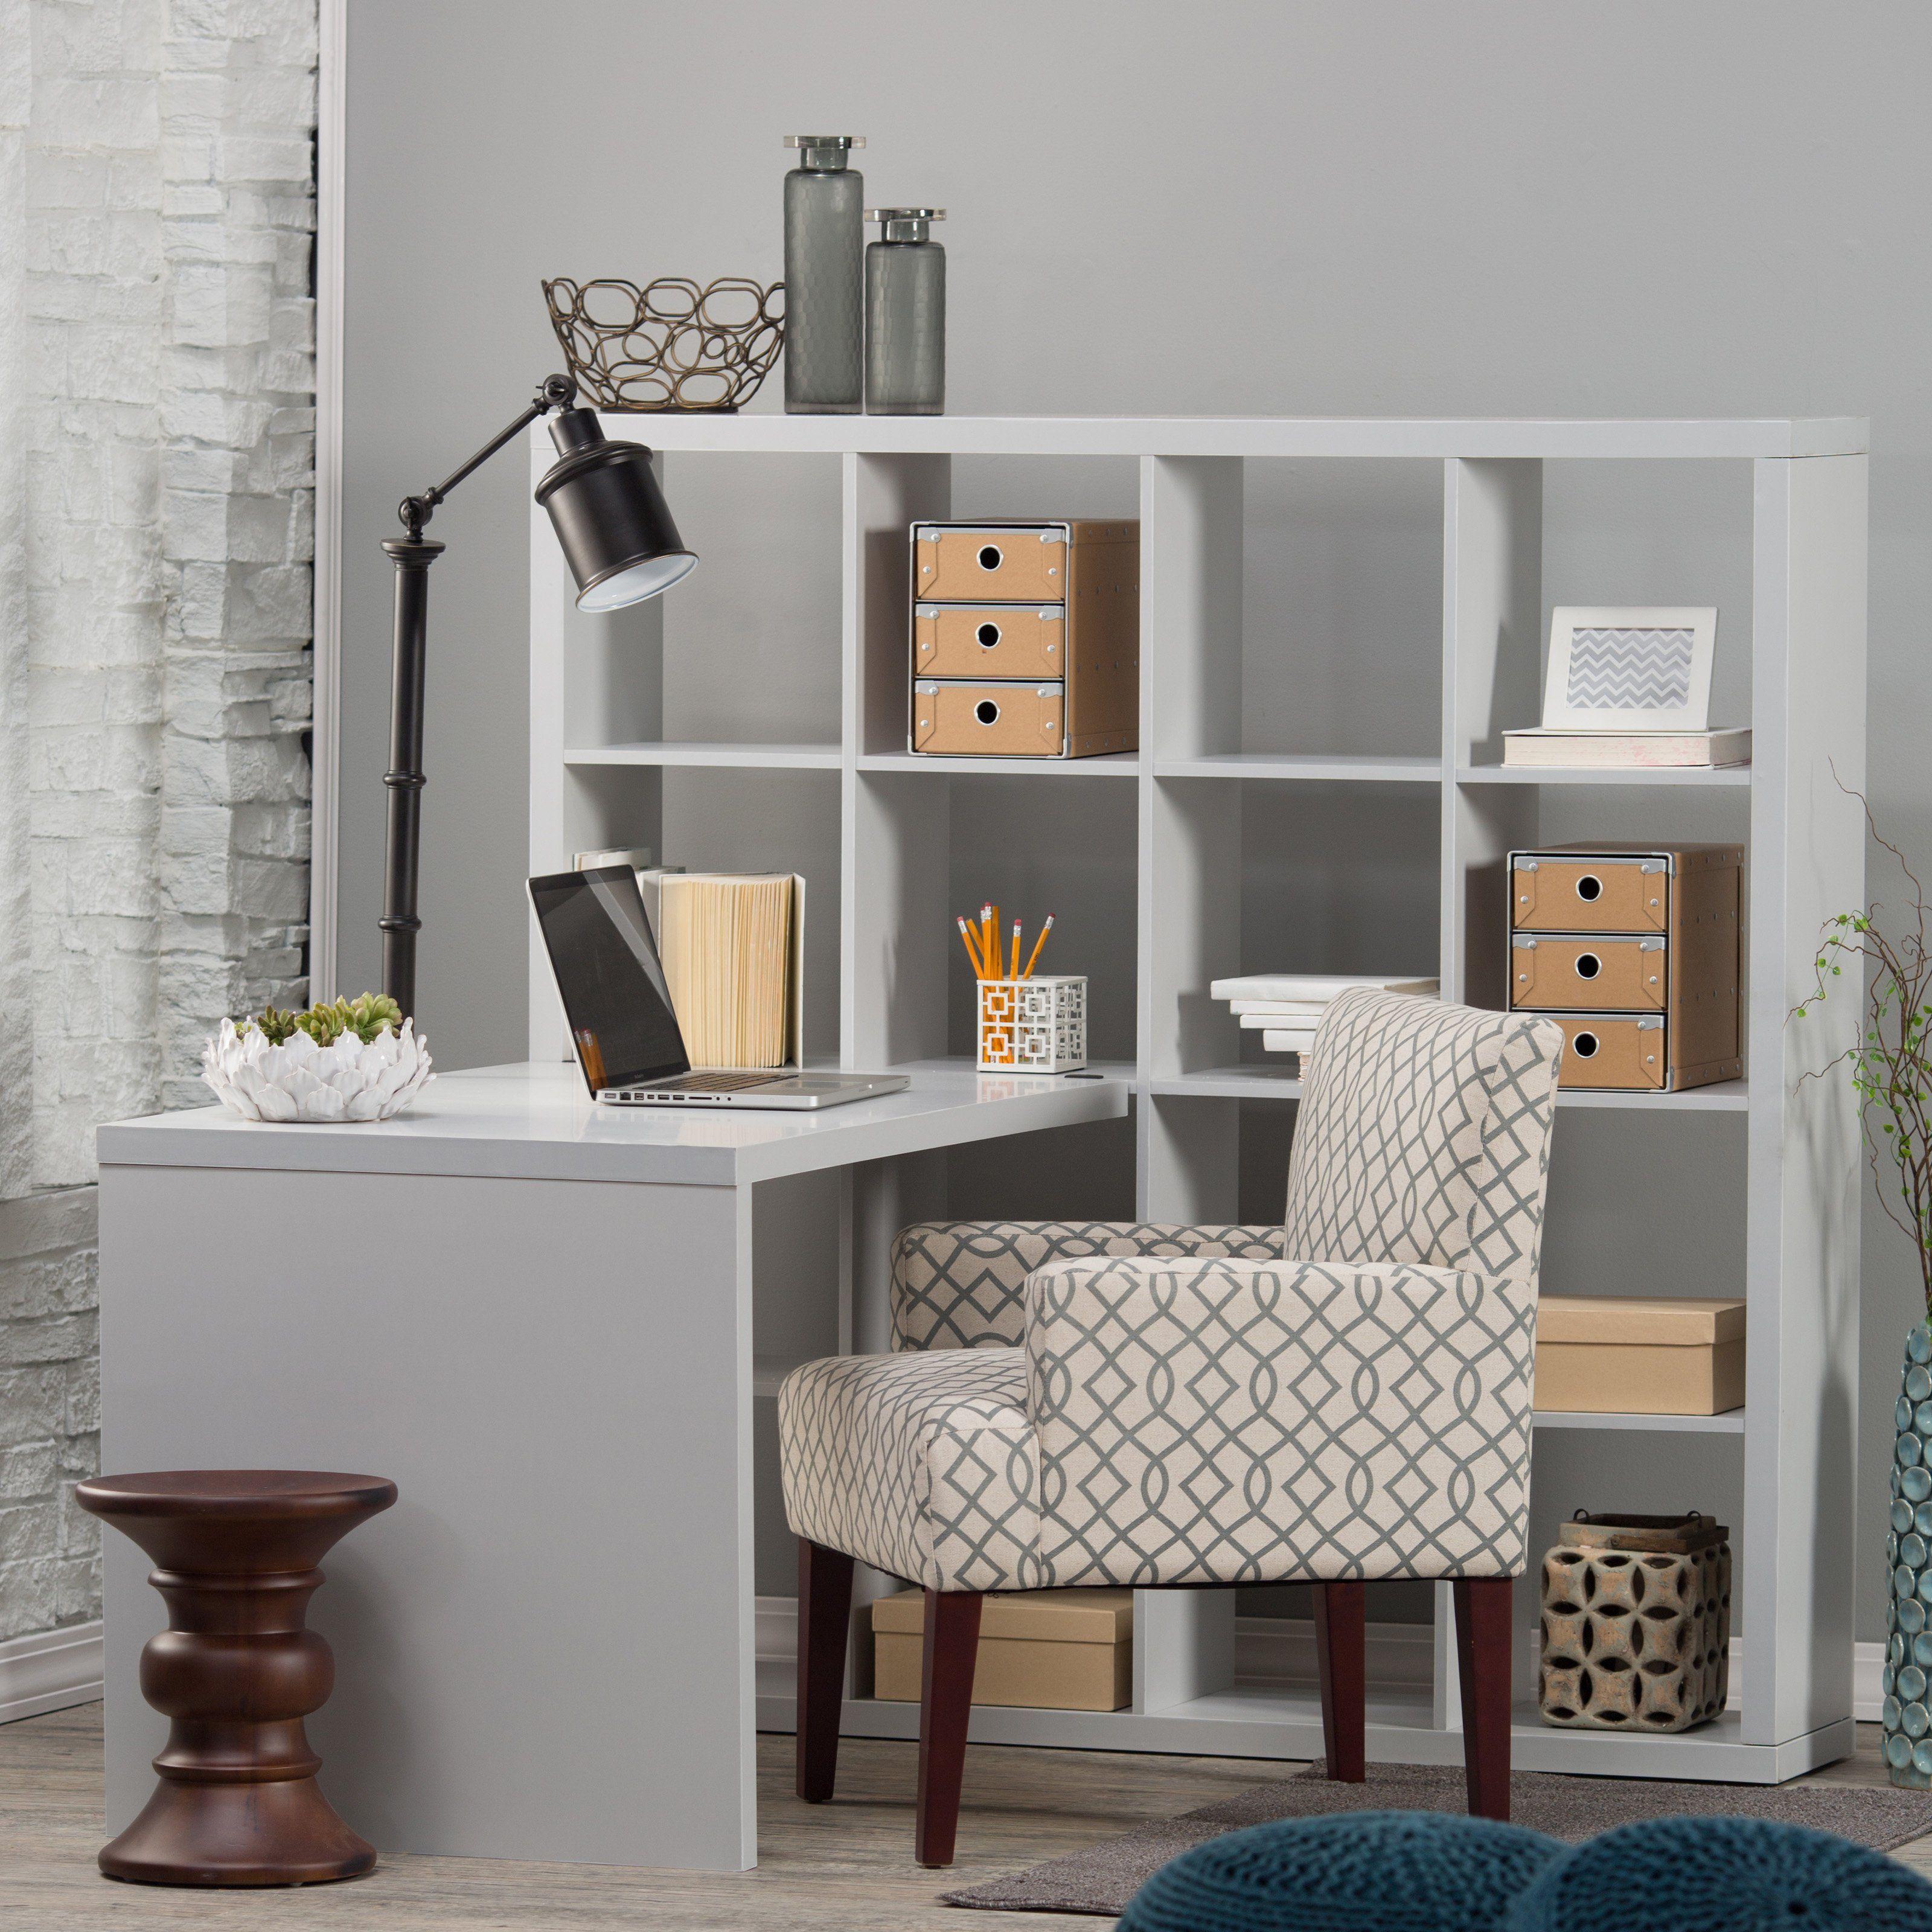 cgtrader tga asset fbx table office old ma models gray model low furniture desk mb poly